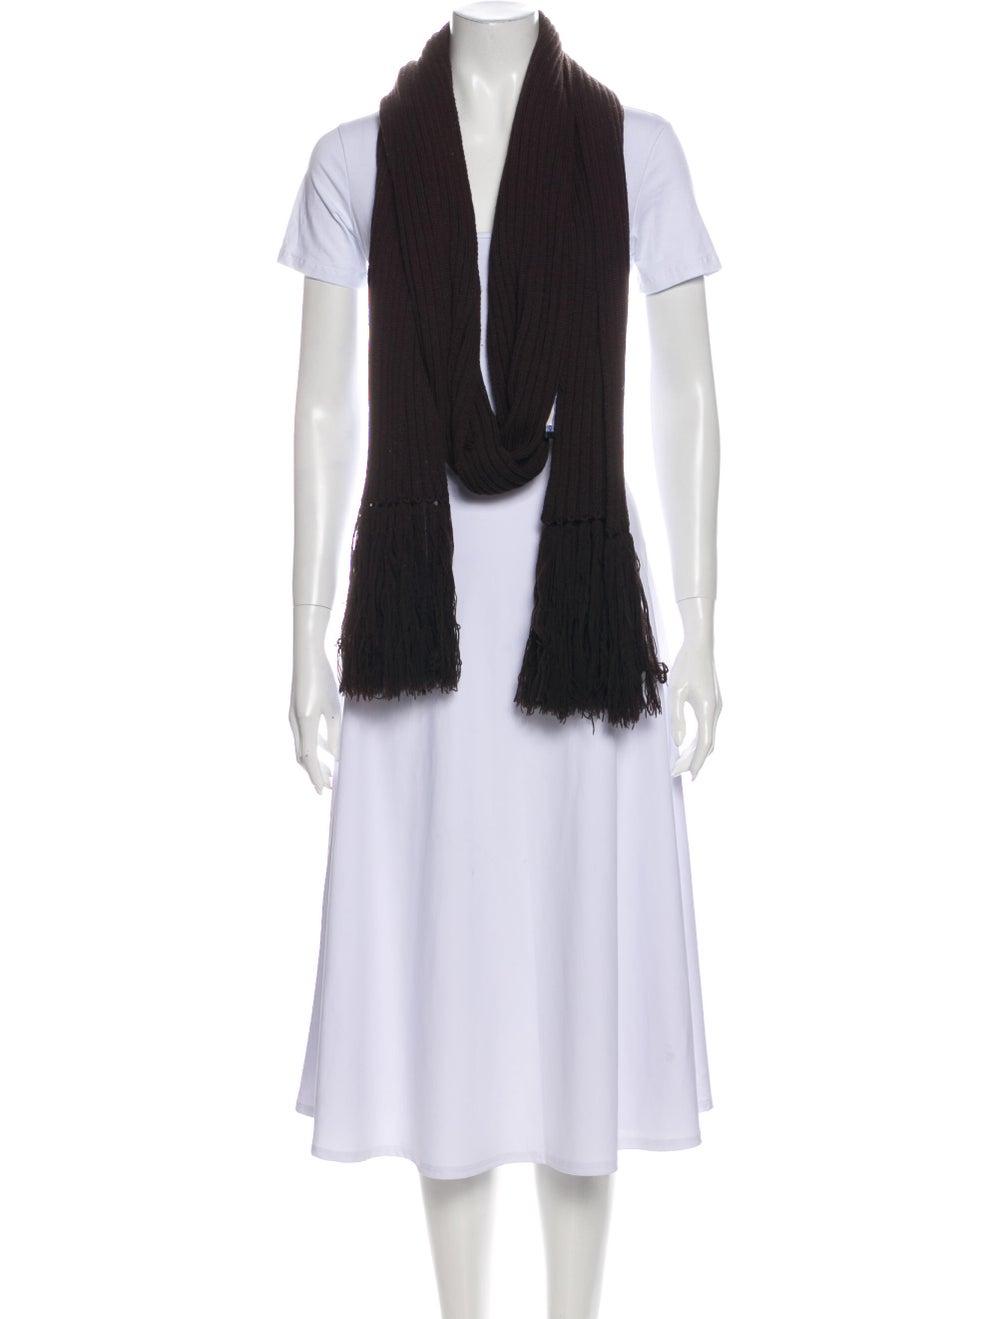 Dolce & Gabbana Knit Fringe Scarf Brown - image 3